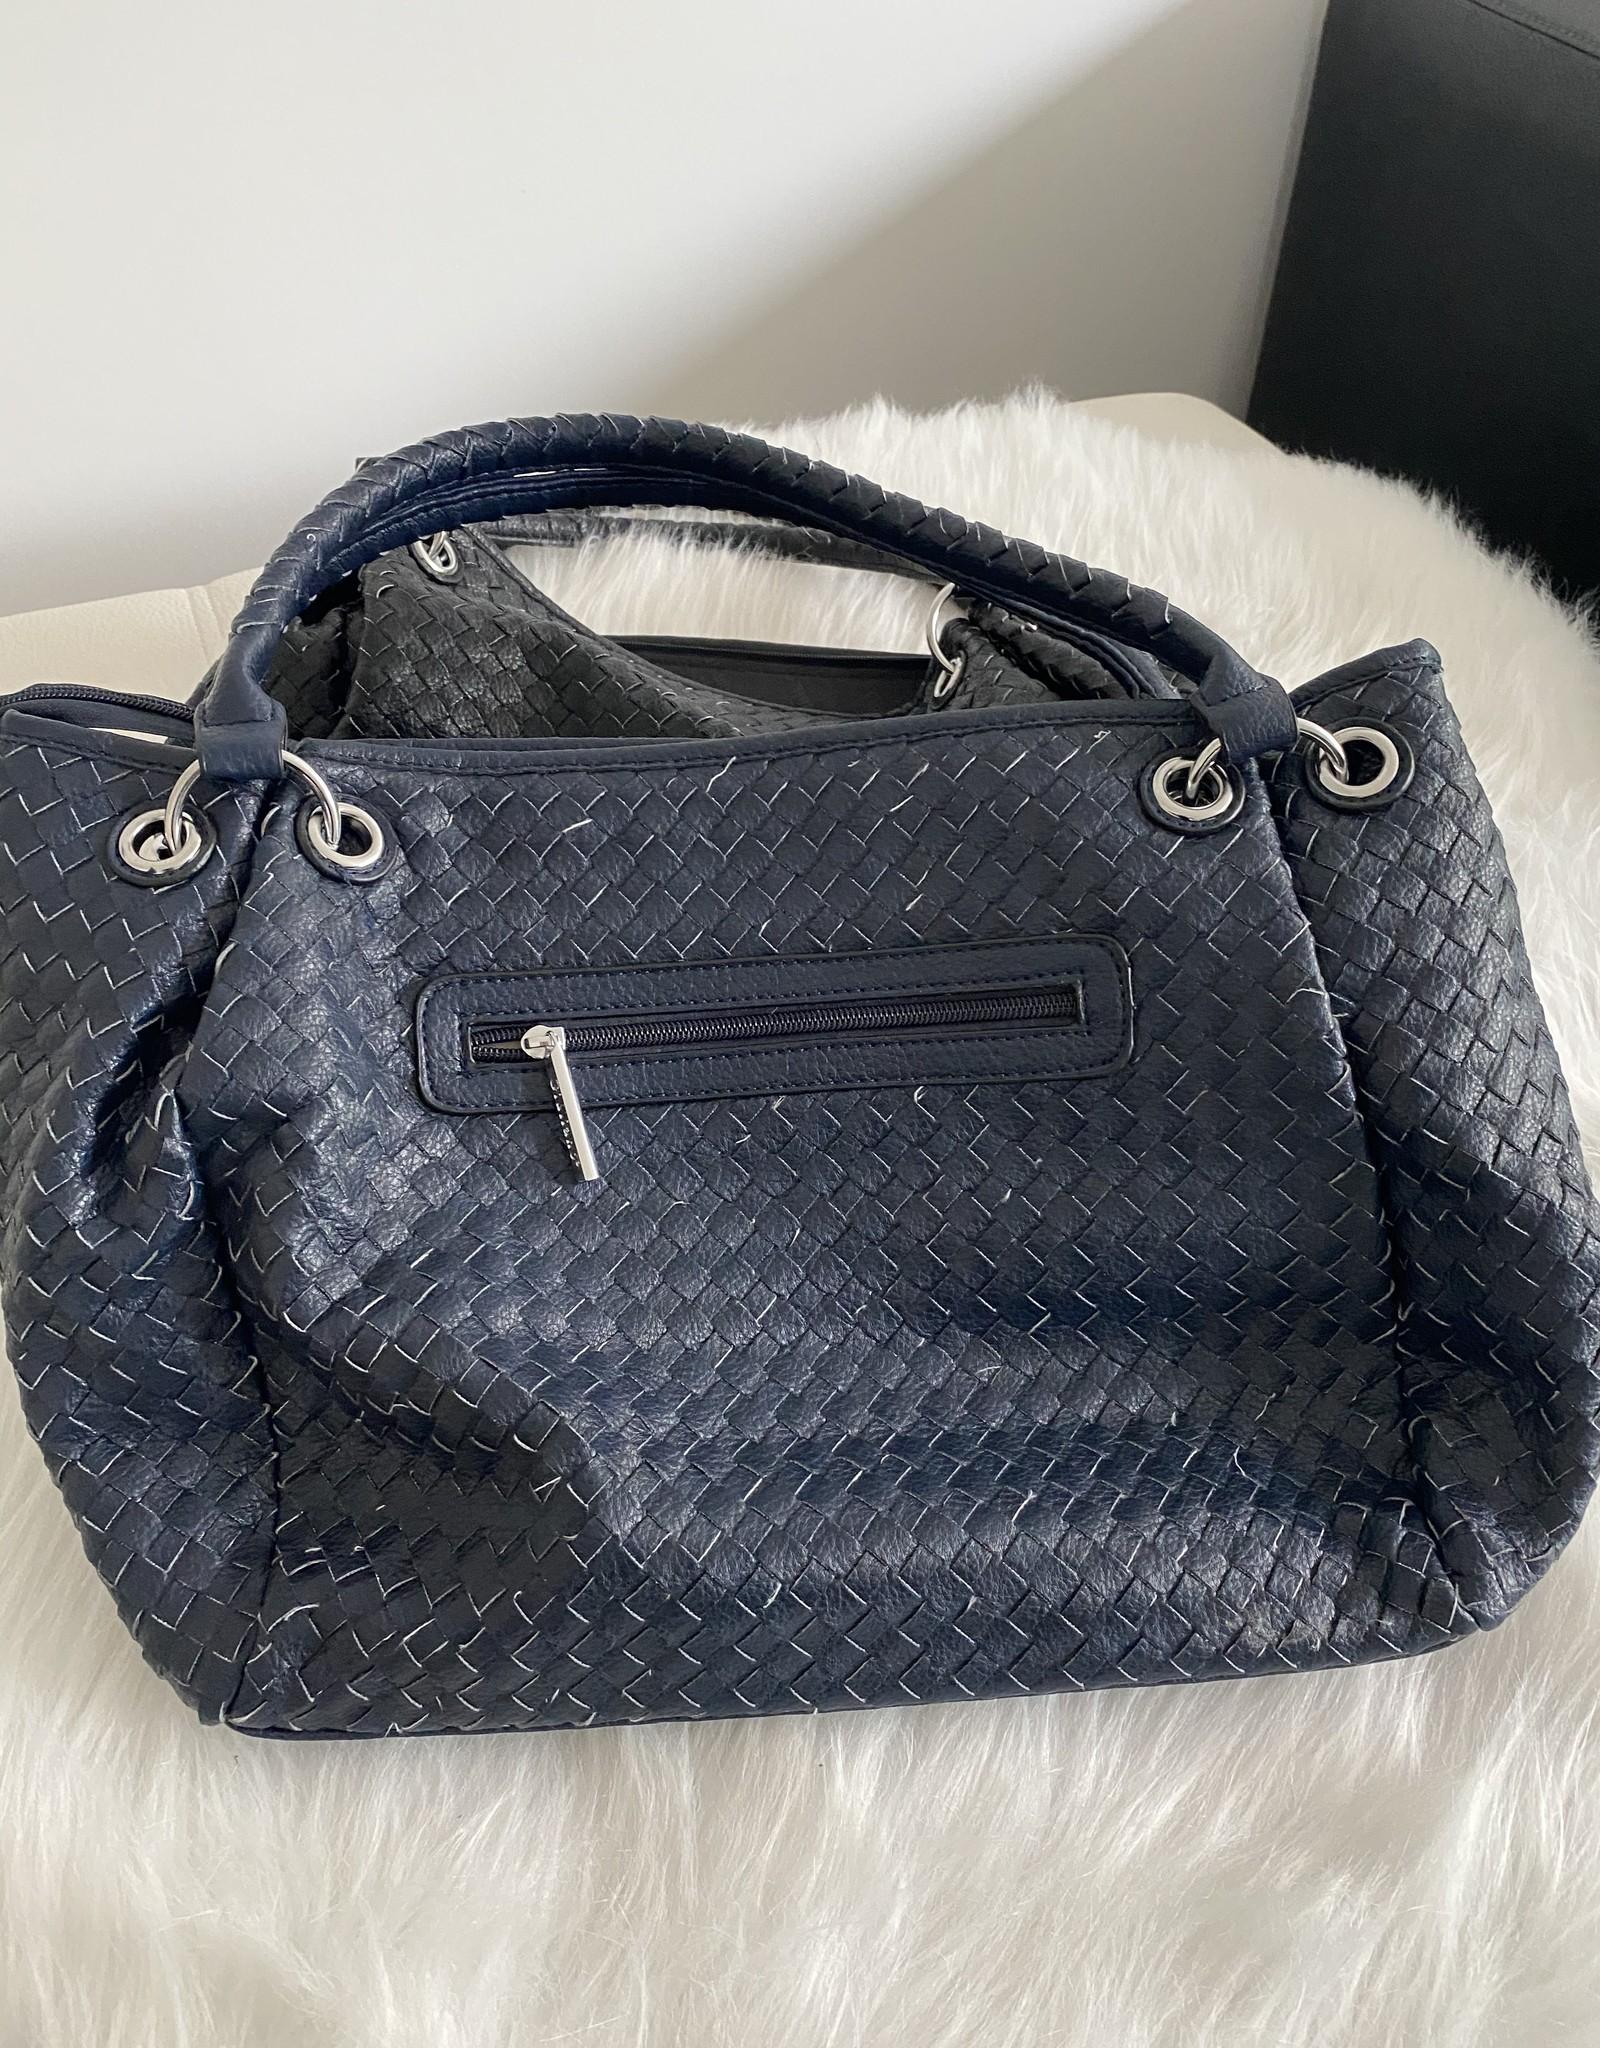 Travelbag braided